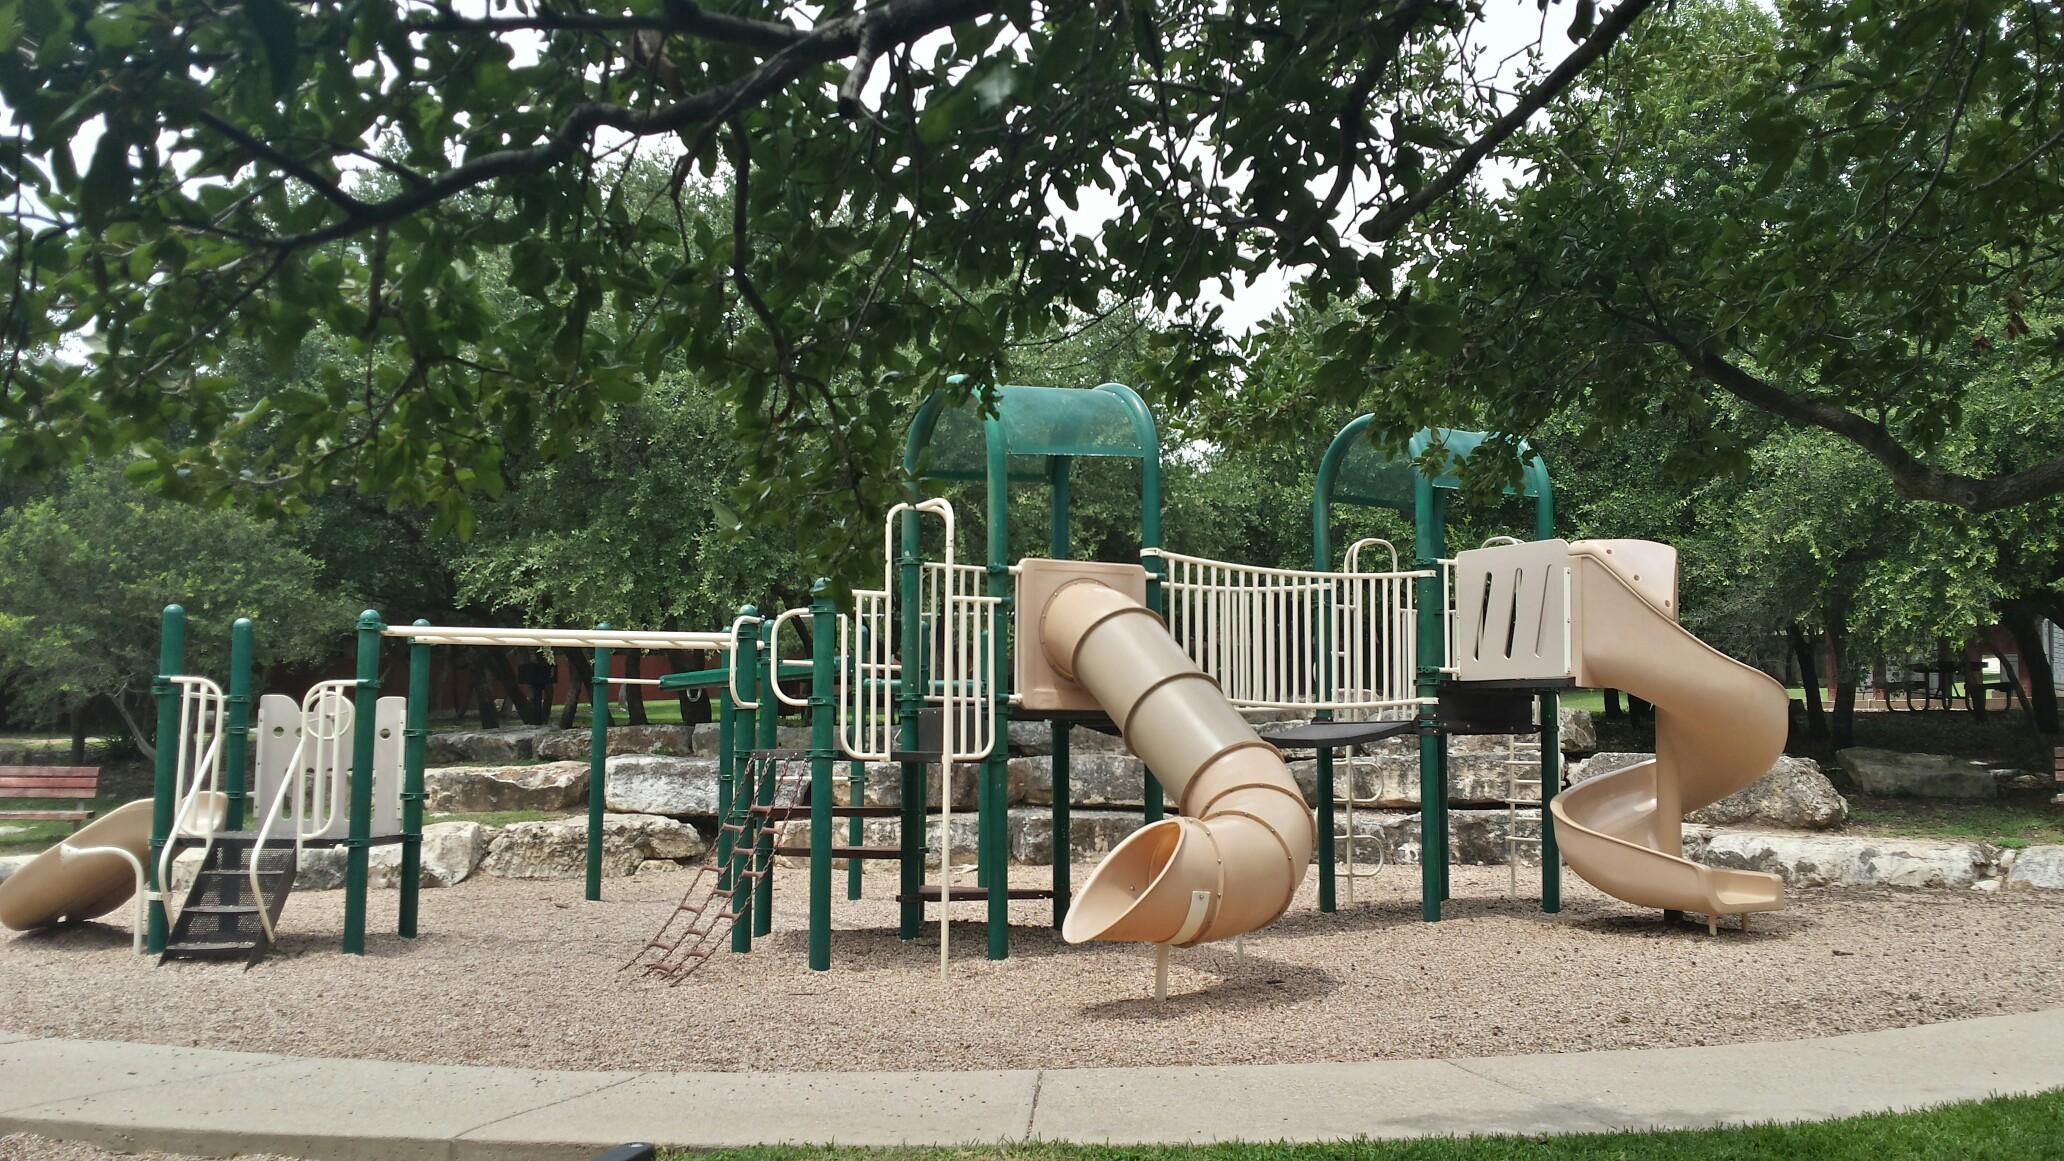 Canyon Glen Playground